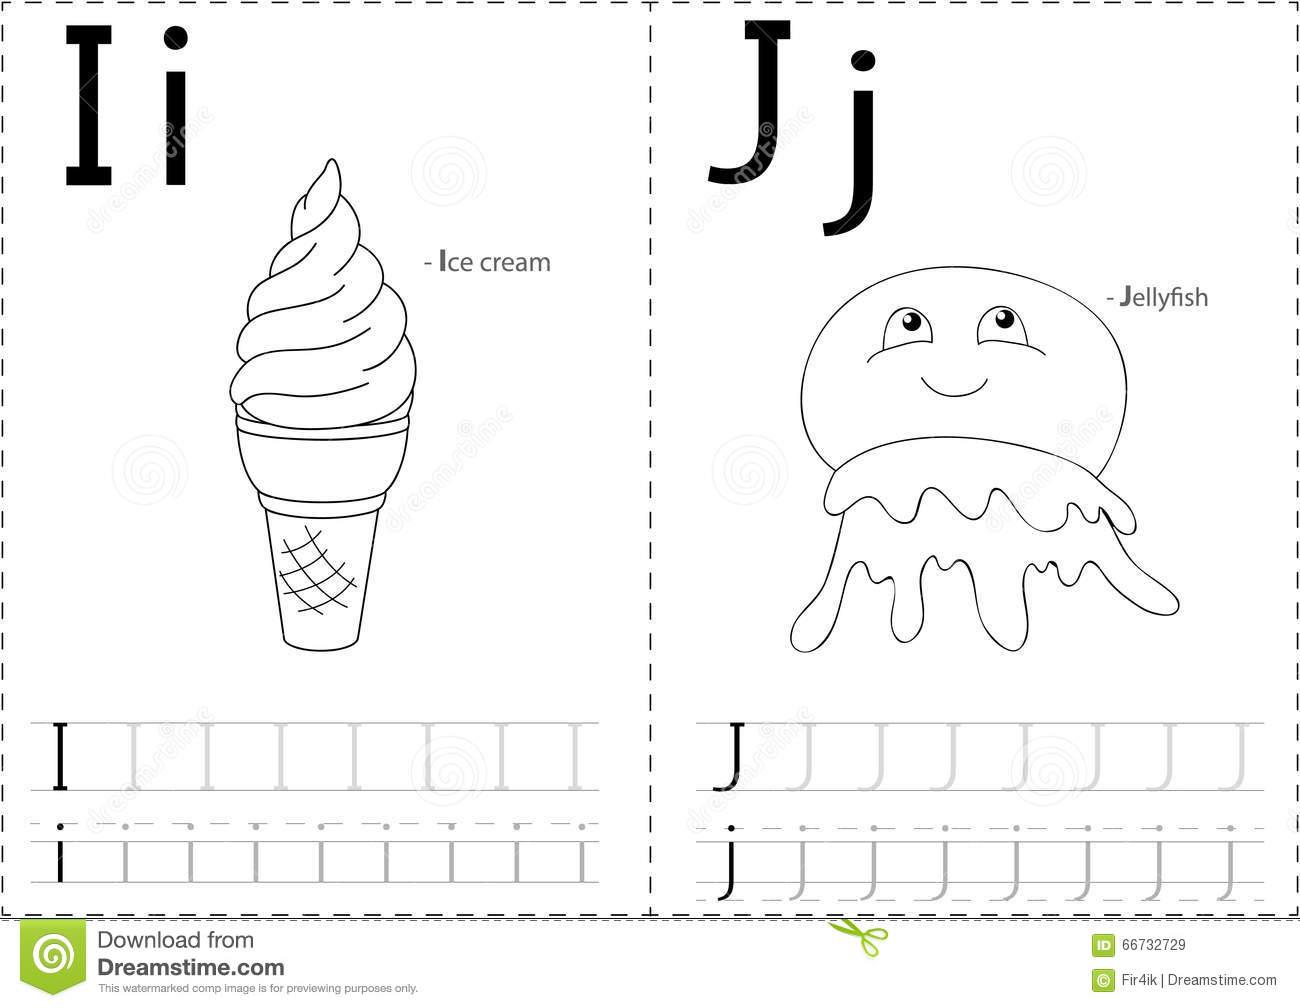 Cartoon Ice Cream And Jellyfish Alphabet Tracing Worksheet